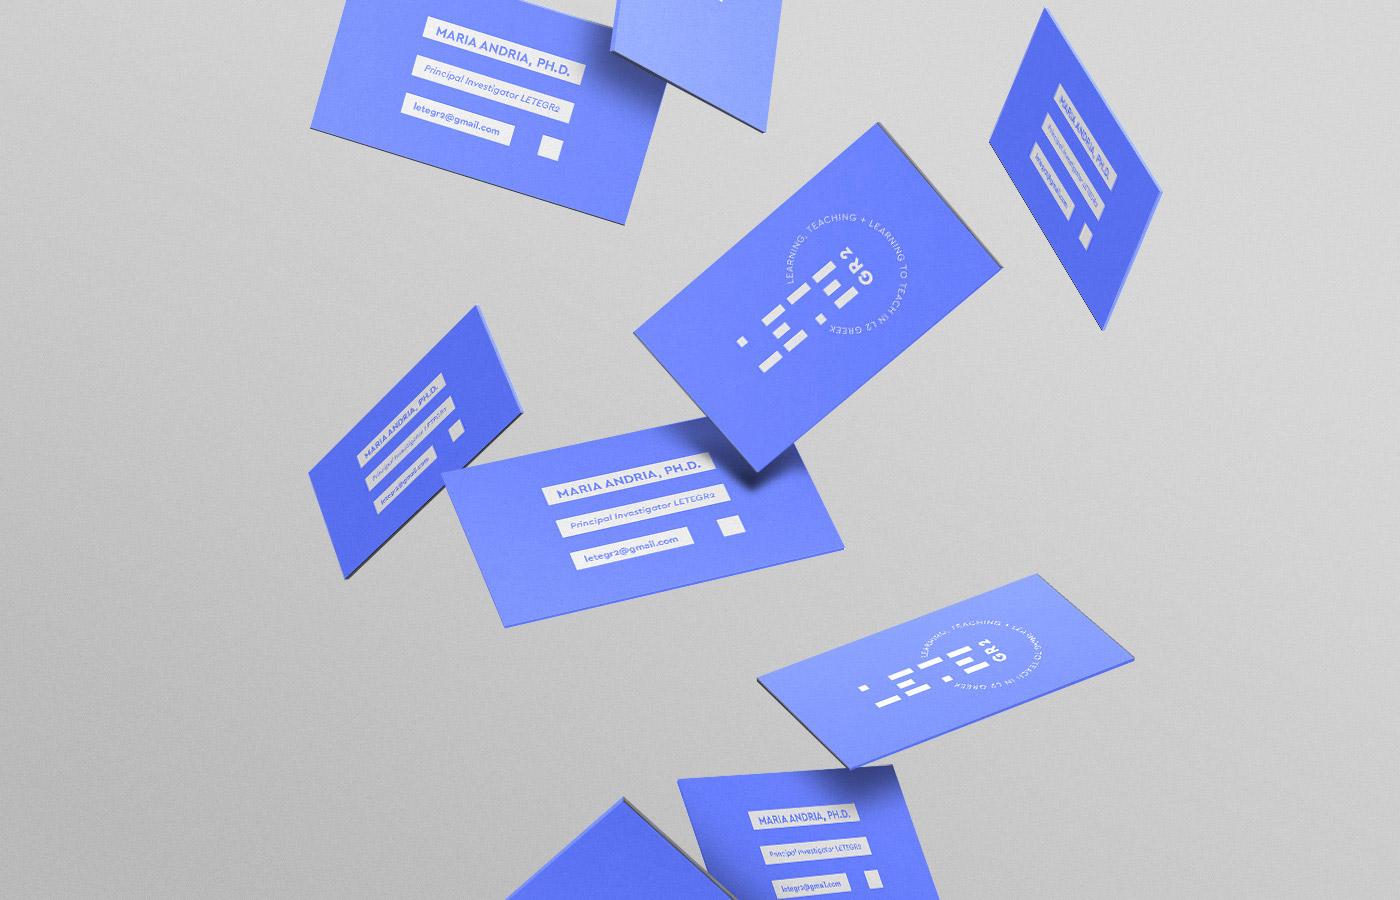 learning teaching greek research university logo design branding lines azure blue business cards